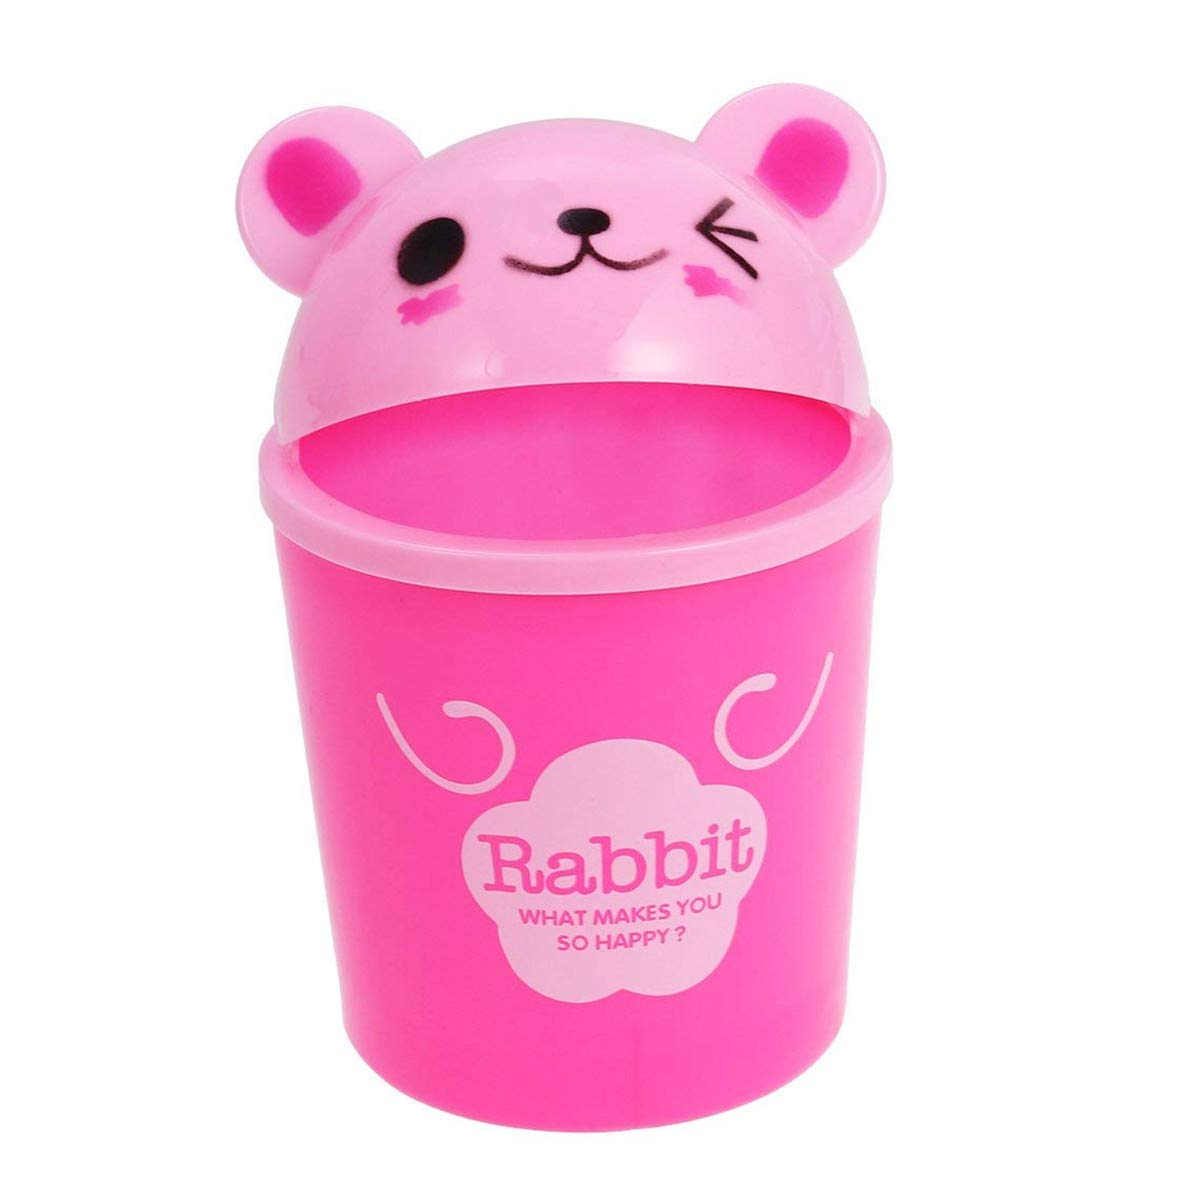 Nuobo Mini Trash Can with Lid Desktop Storage Organizer Debris Bucket Cute Plastic Small Trash Bins Creative Wastebaskets (Panda)